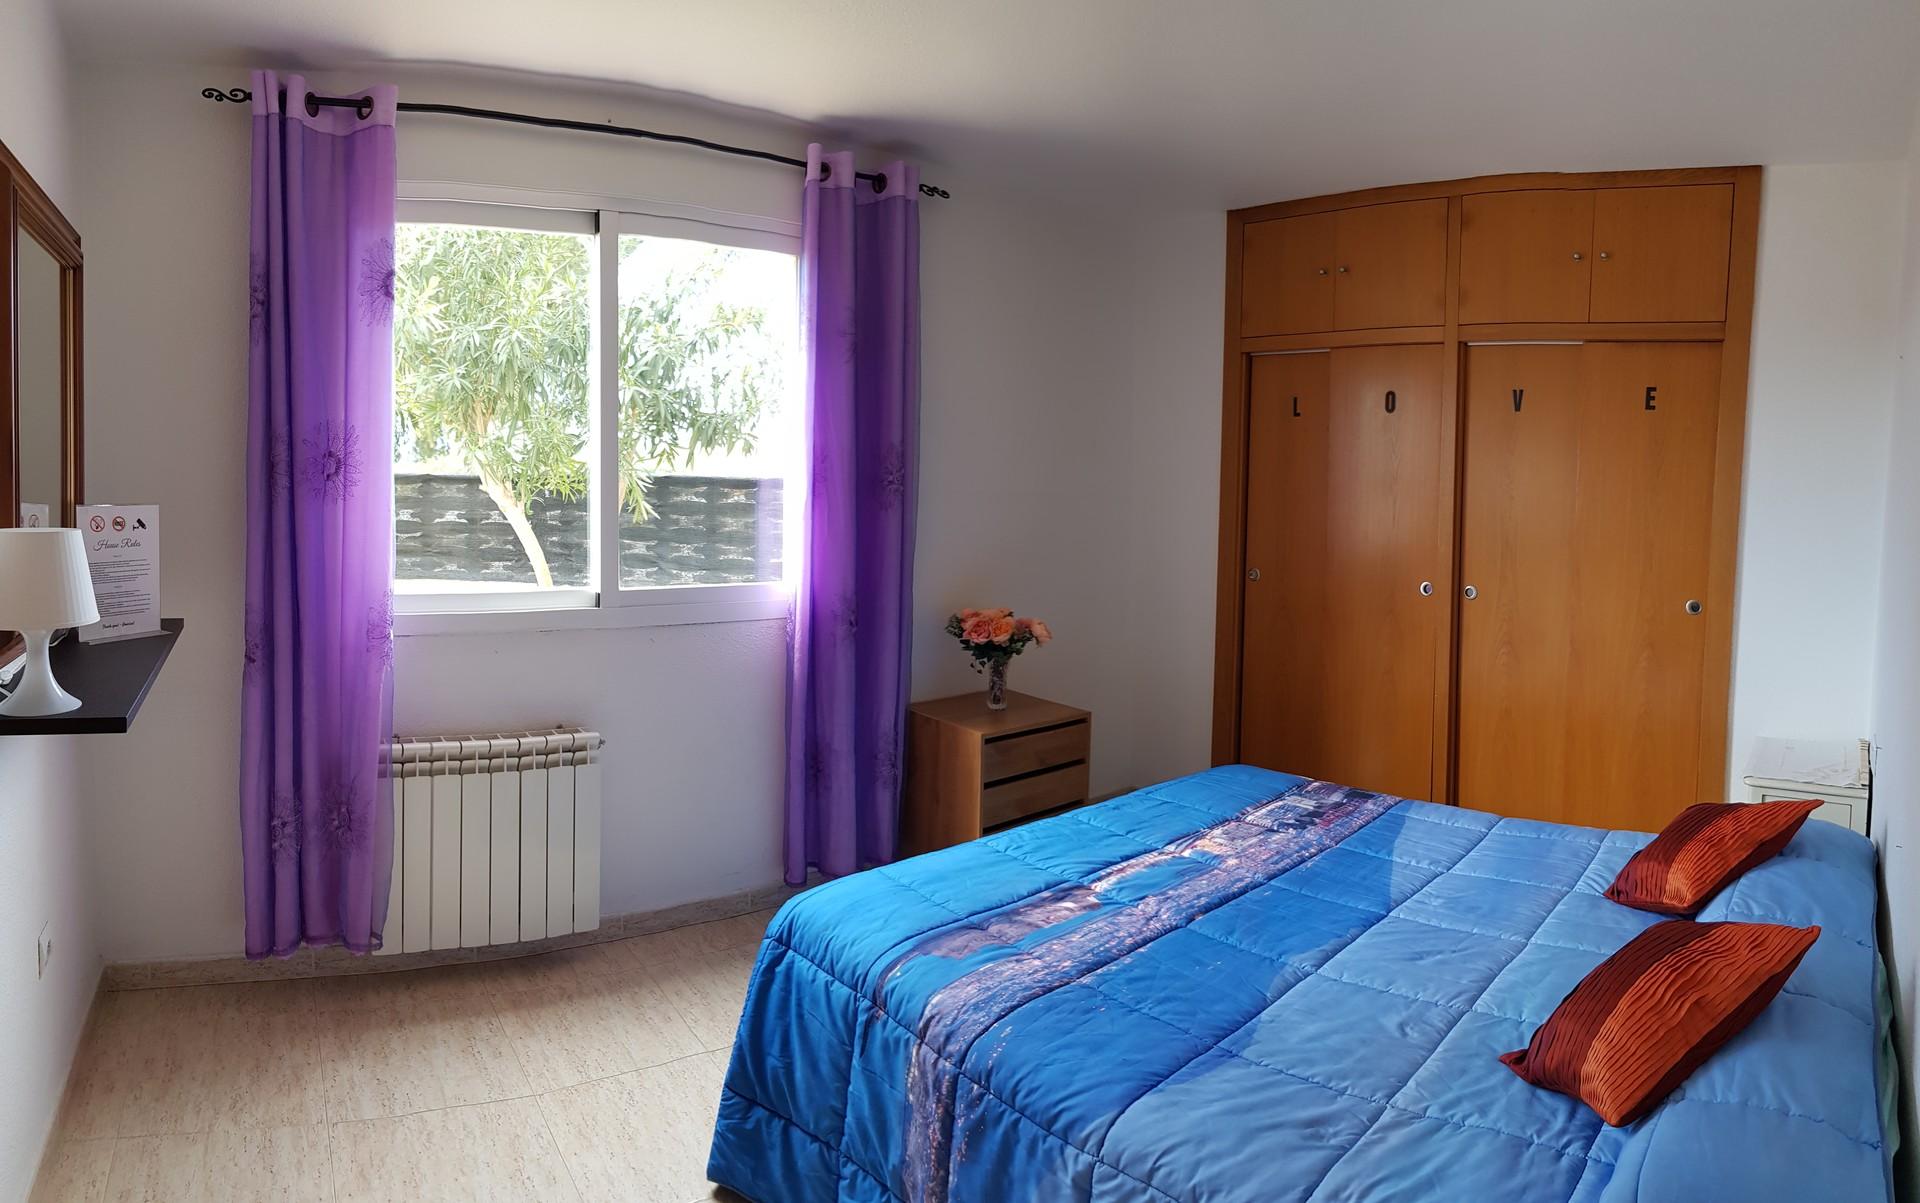 Affittasi splendida stanza ideale per studenti erasmus, in ...